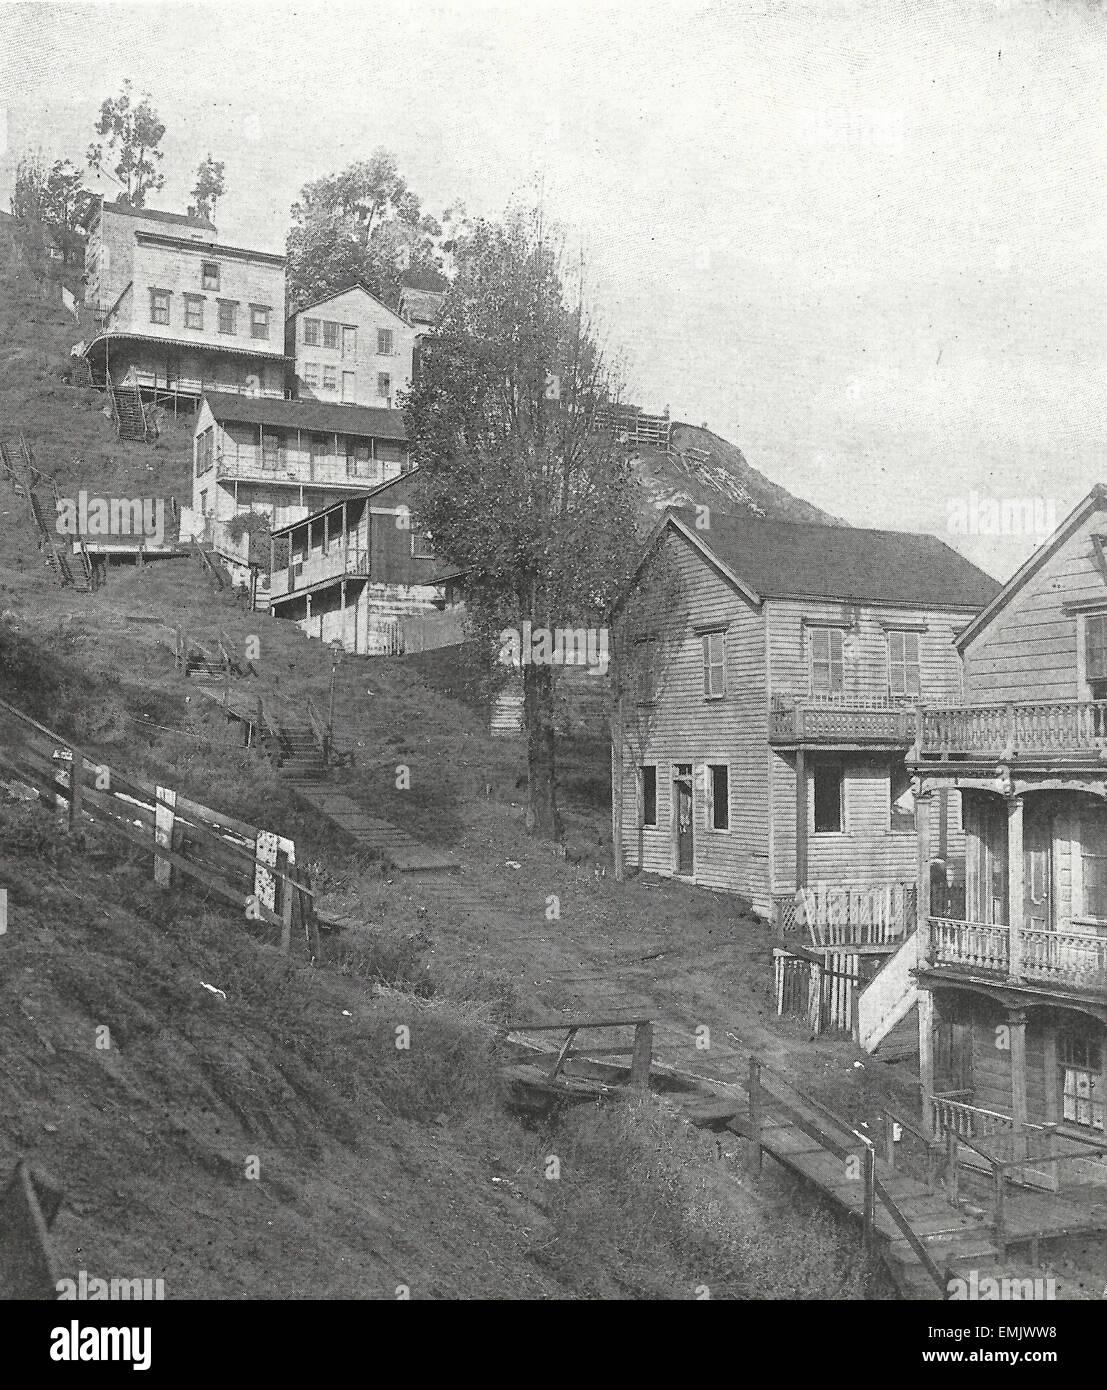 White apron inc brea ca - Telegraph Hill San Francisco California Taken Before The Earthquake Of 1906 Stock